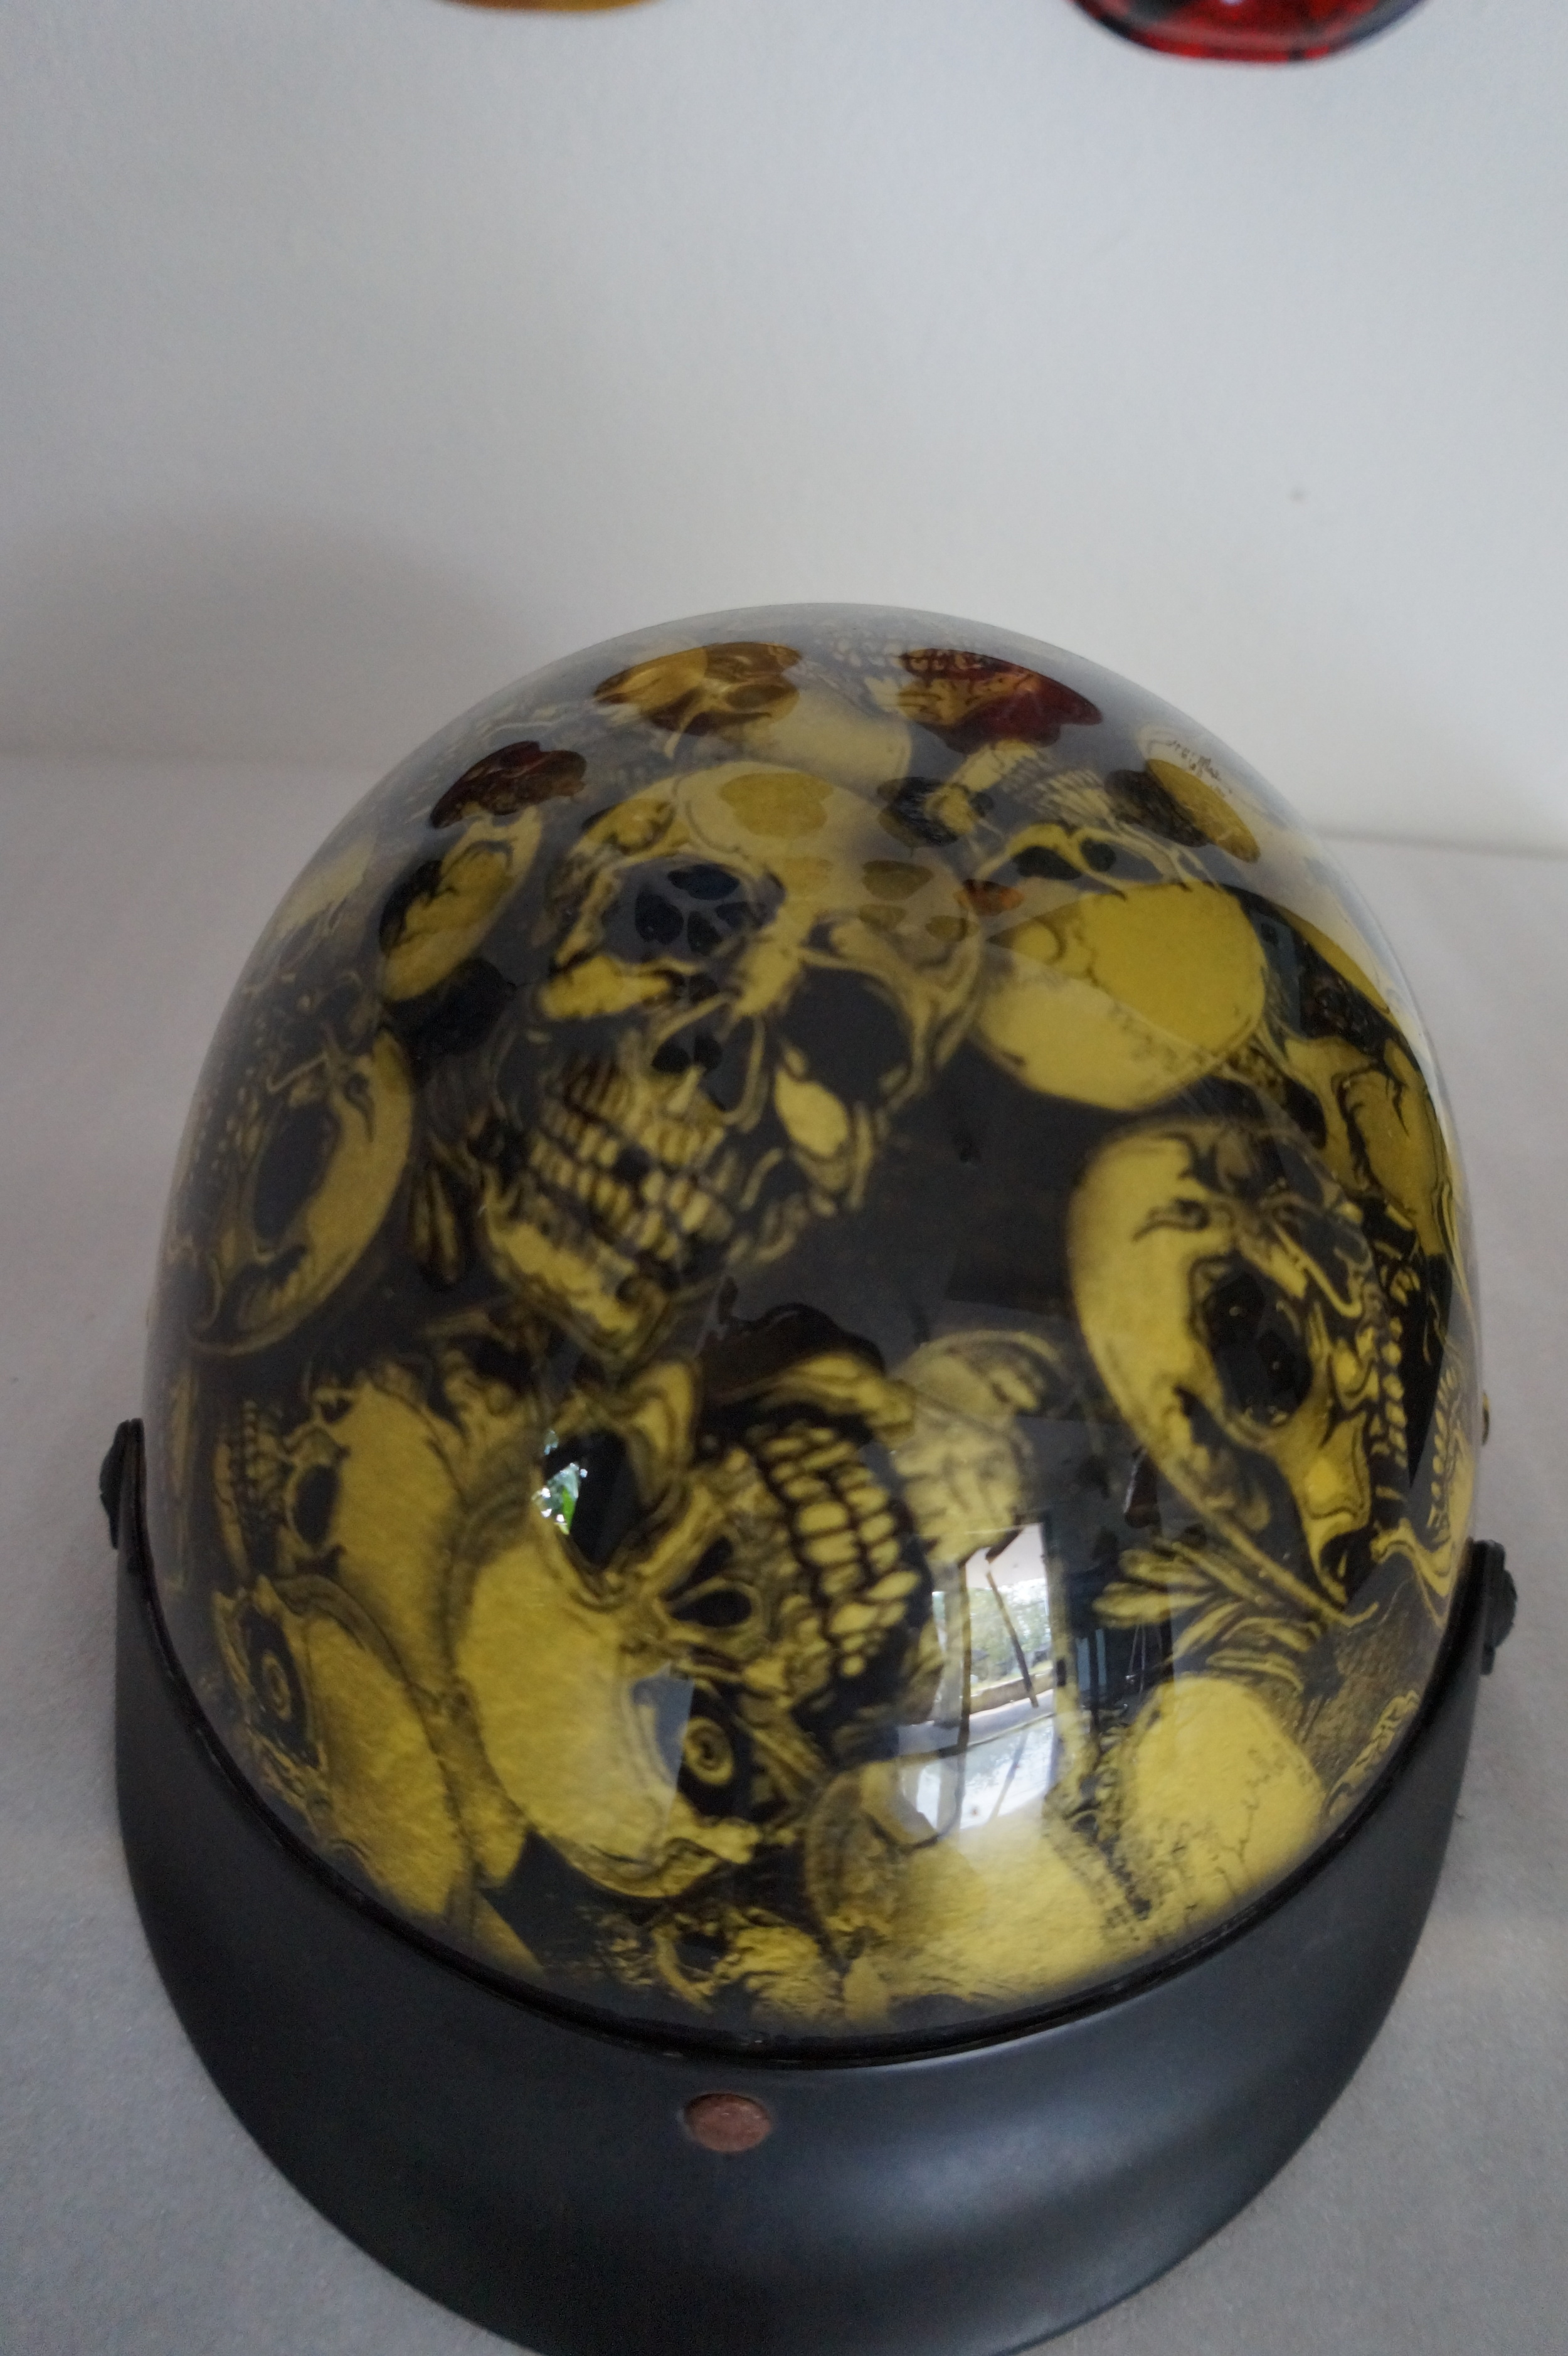 Basic Head Topper Helmet - Custom Paint www.electricbikesthailand.com